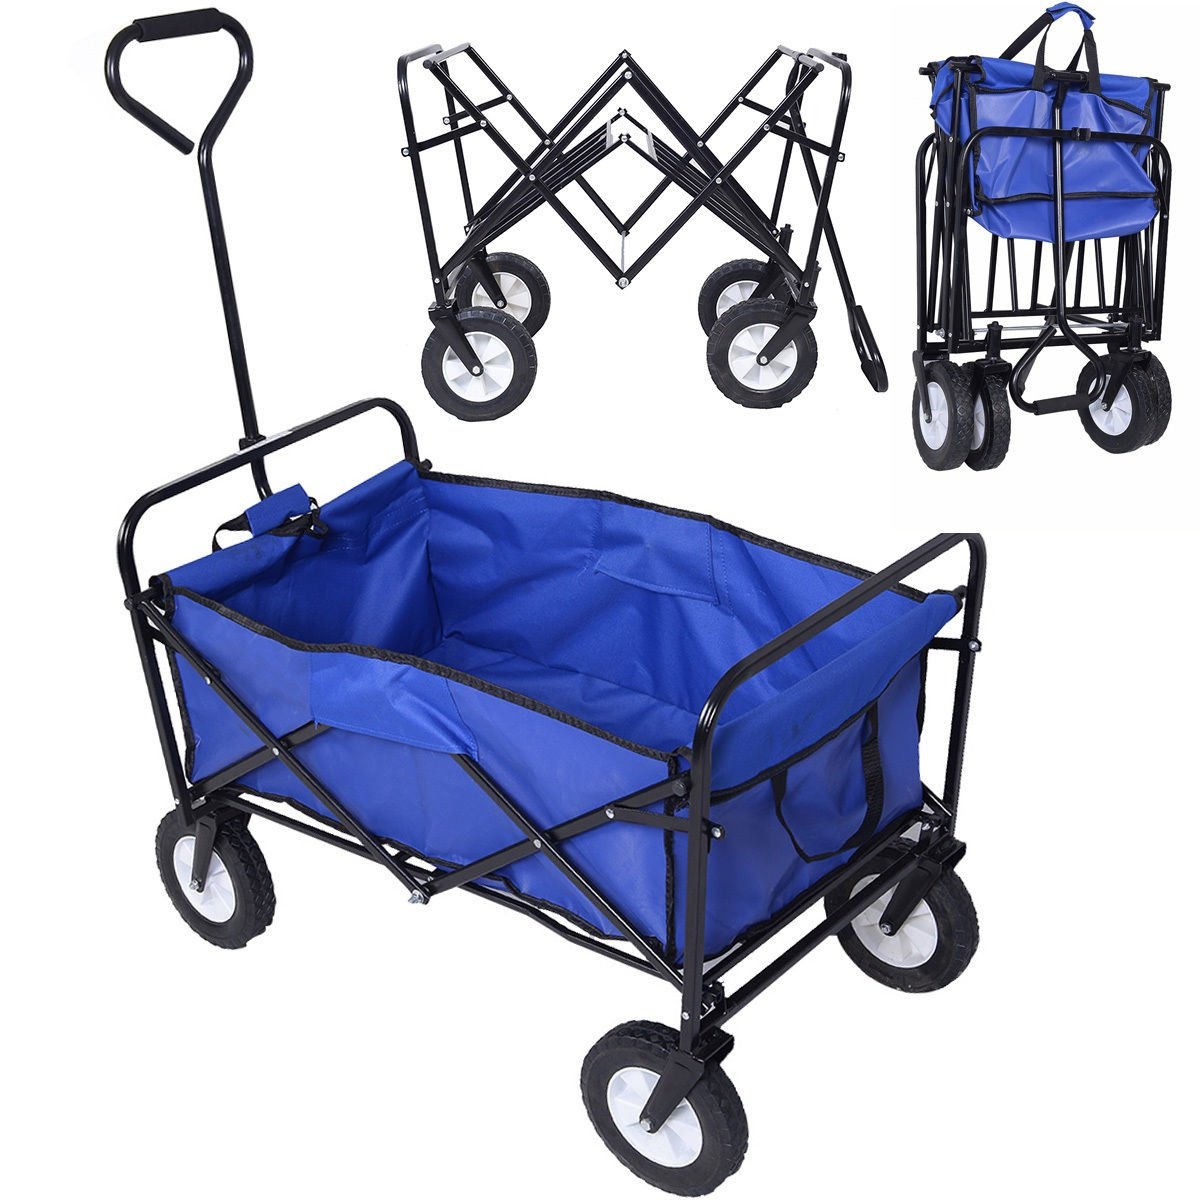 folding garden cart. Amazon.com : Collapsible Folding Wagon Cart Garden Buggy Shopping Beach Toy Sports Blue \u0026 Outdoor L